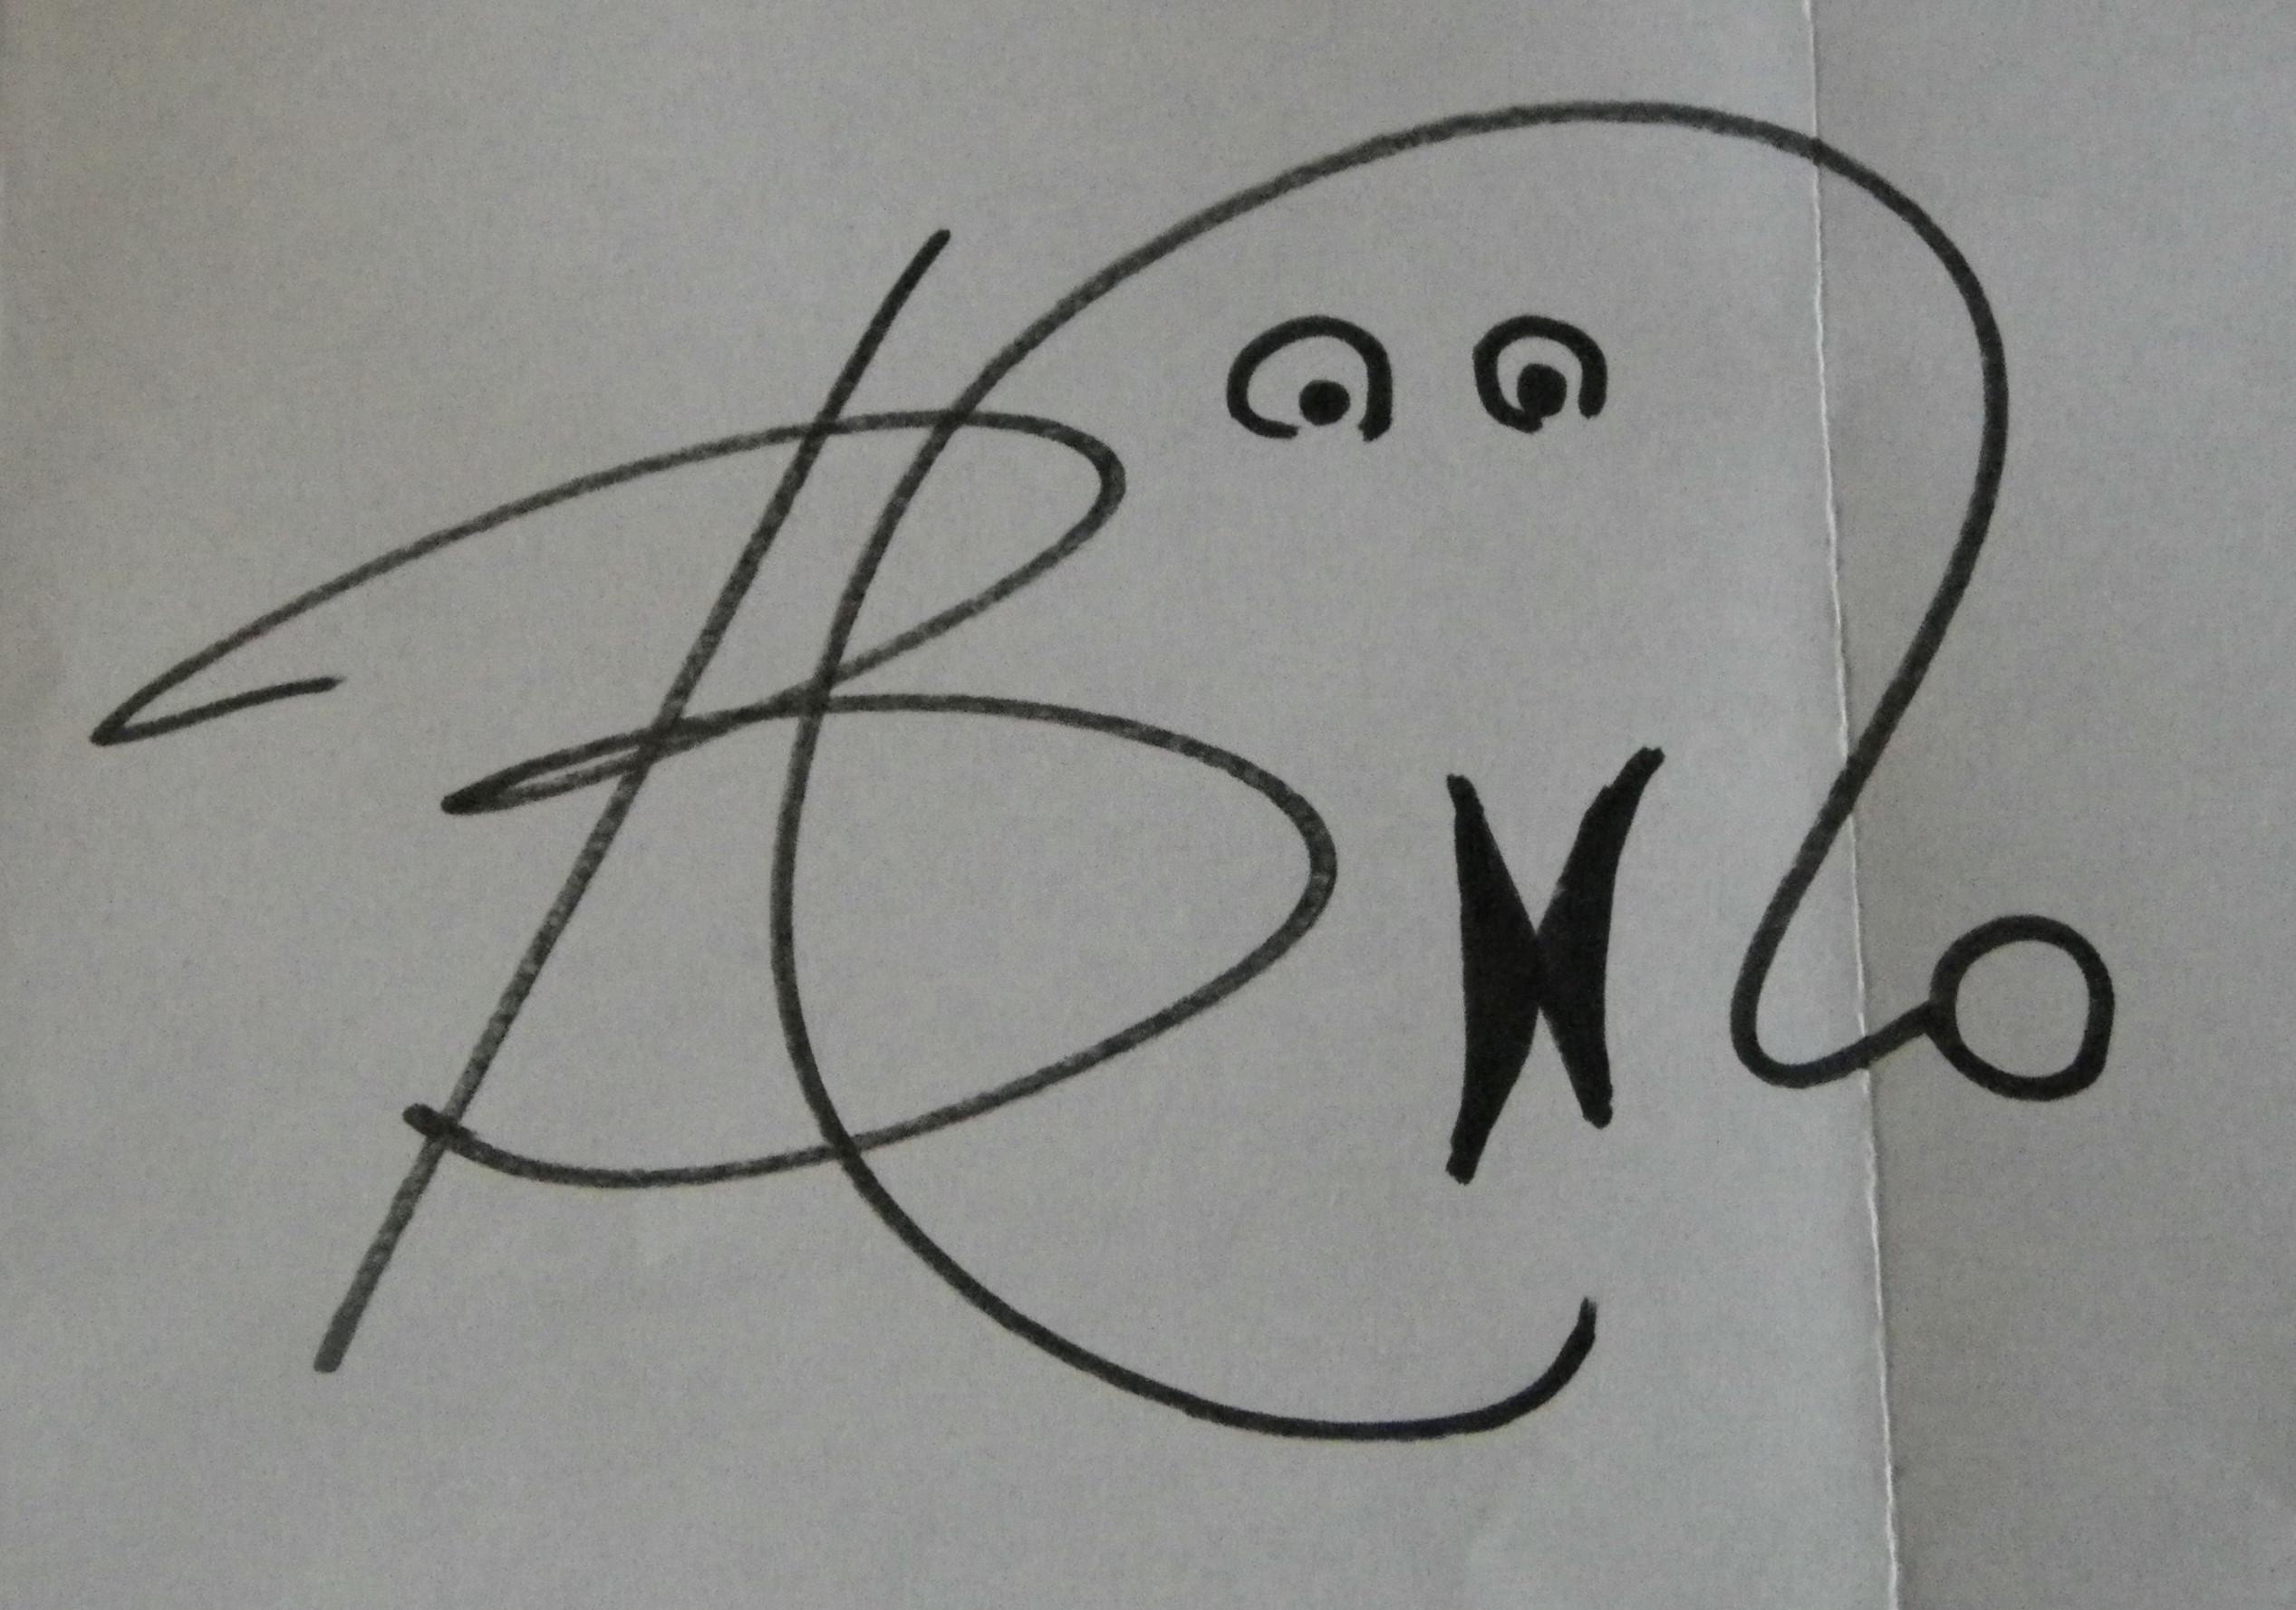 Bernard Beneito's Signature